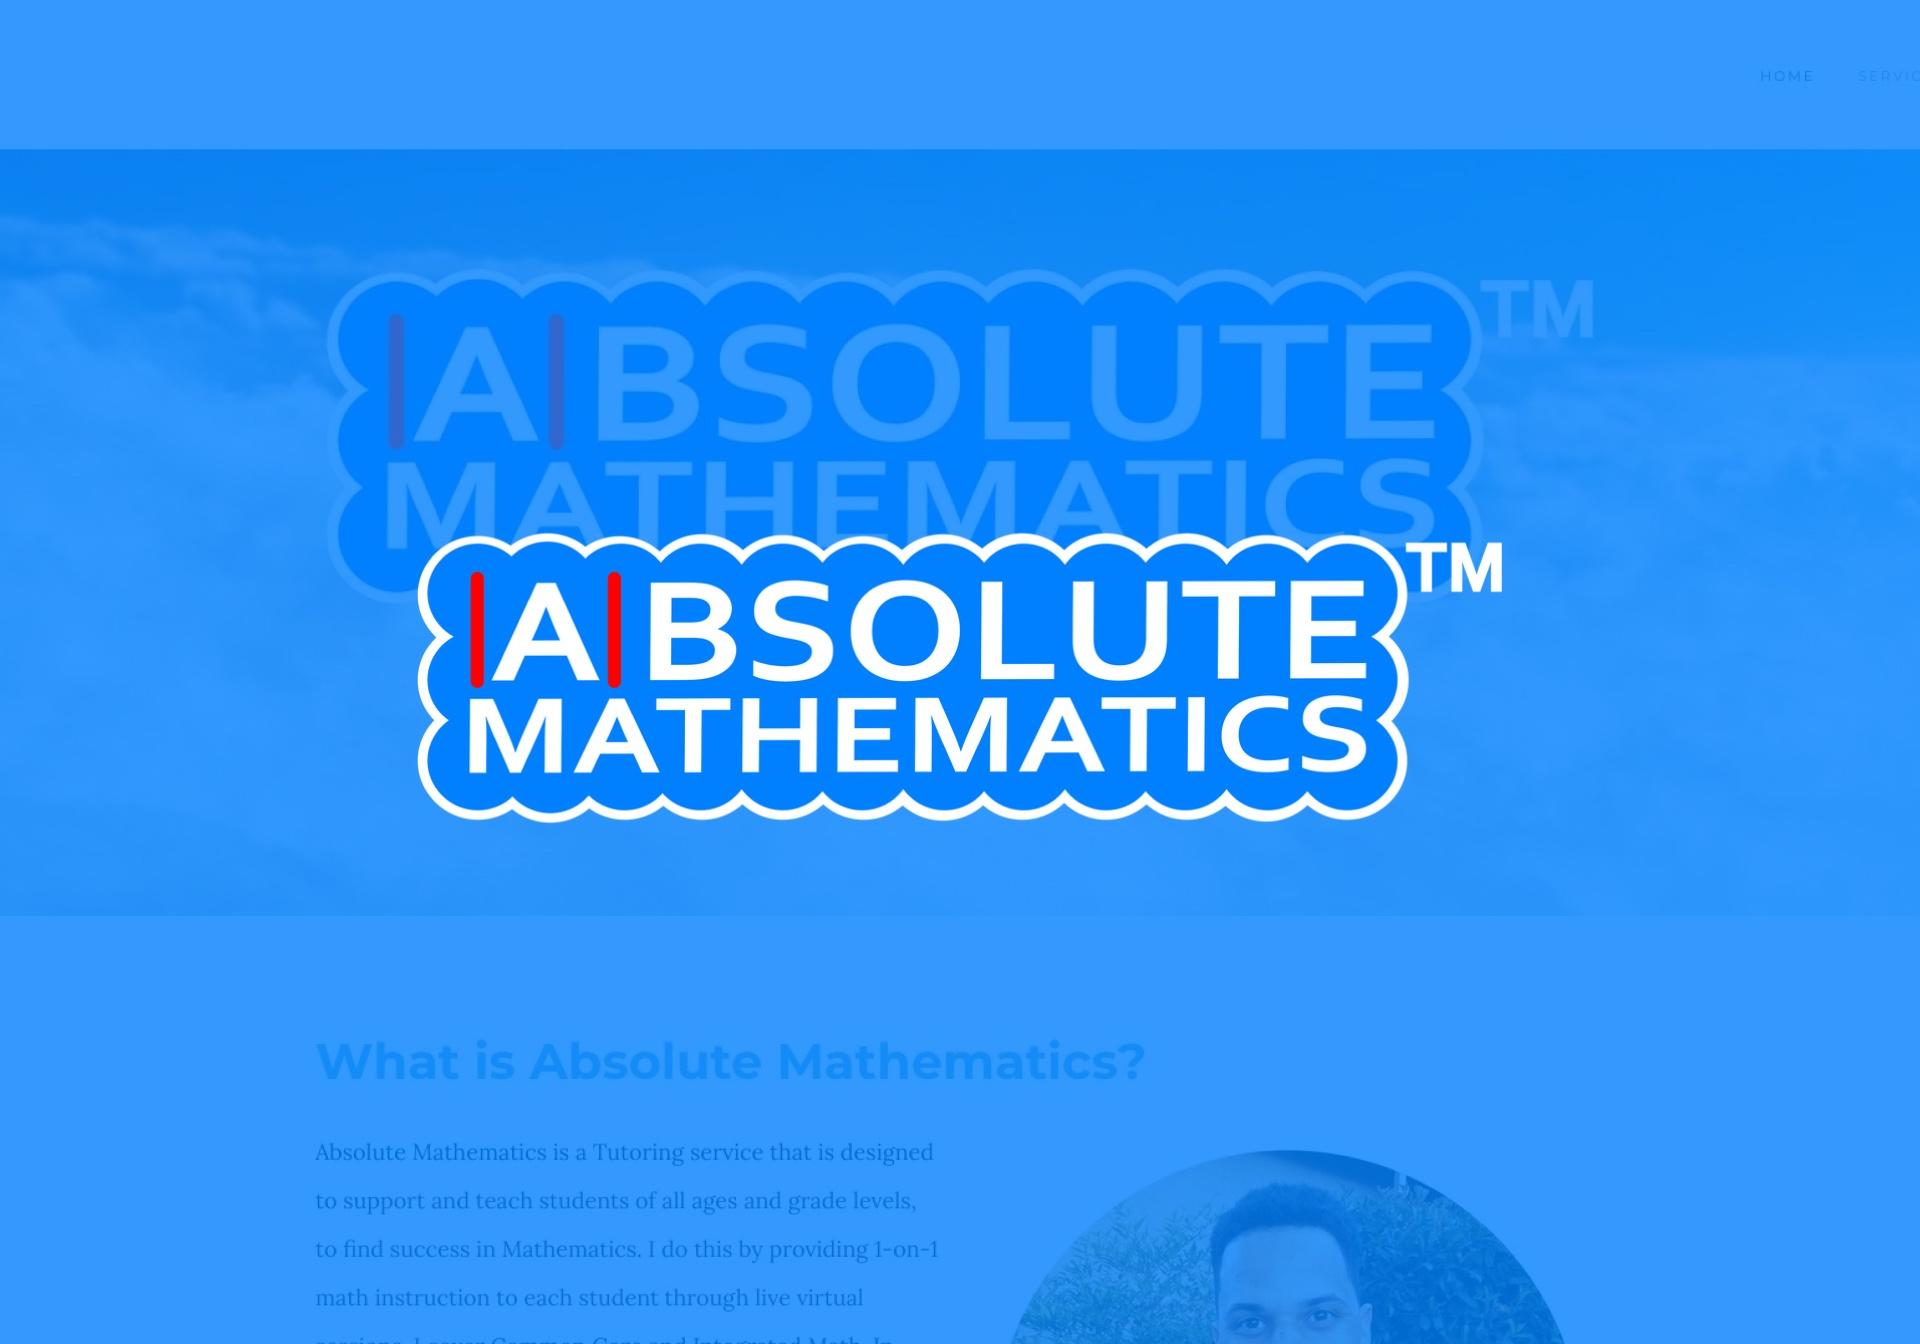 Absolute Mathematics